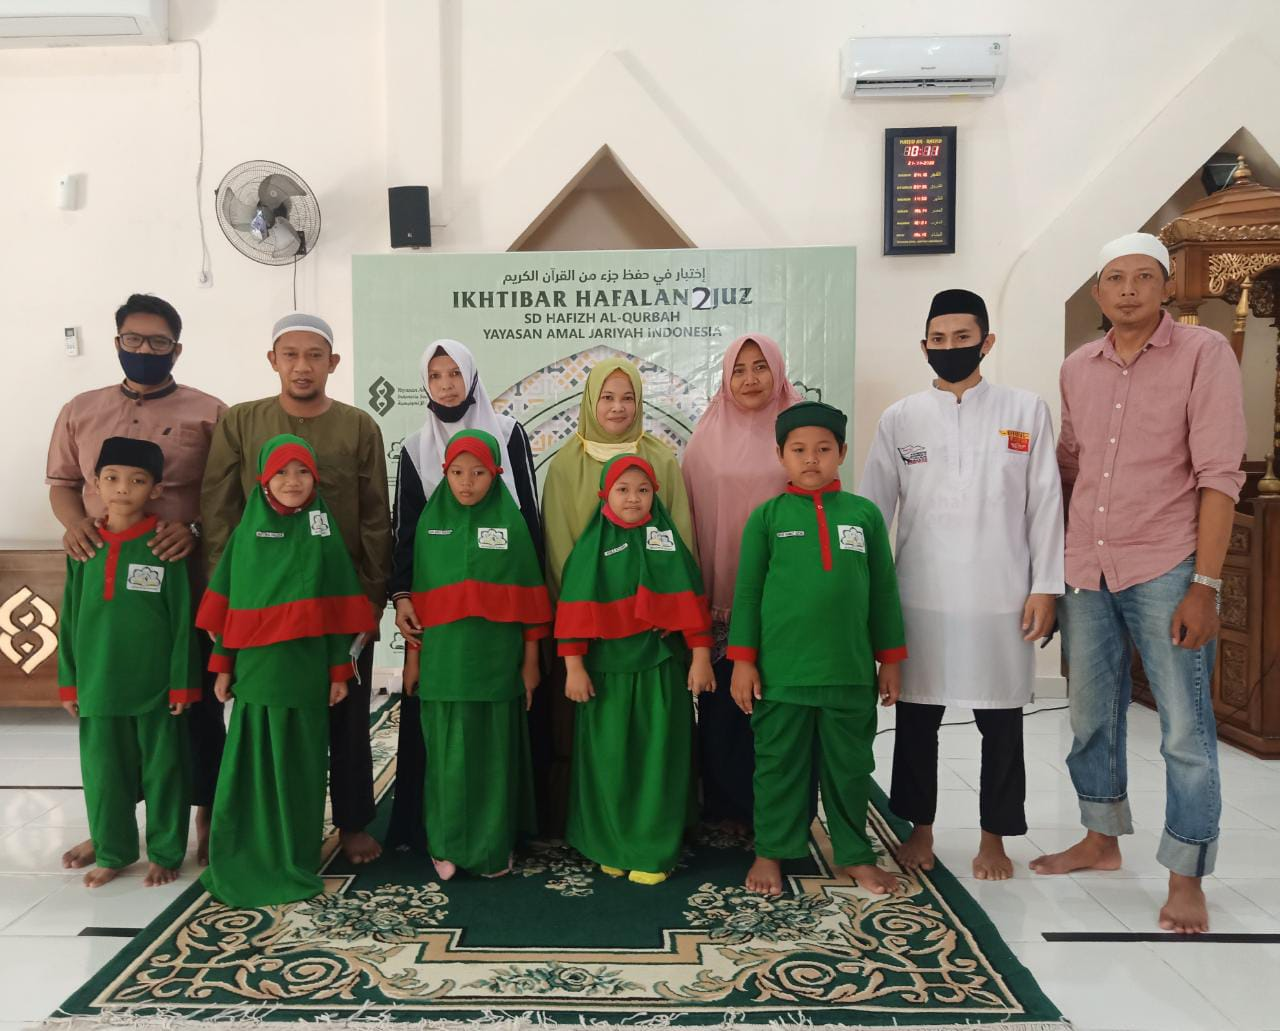 Ikhtibar 2 Juz Murid SD Hafizh Al Qurbah Parepare